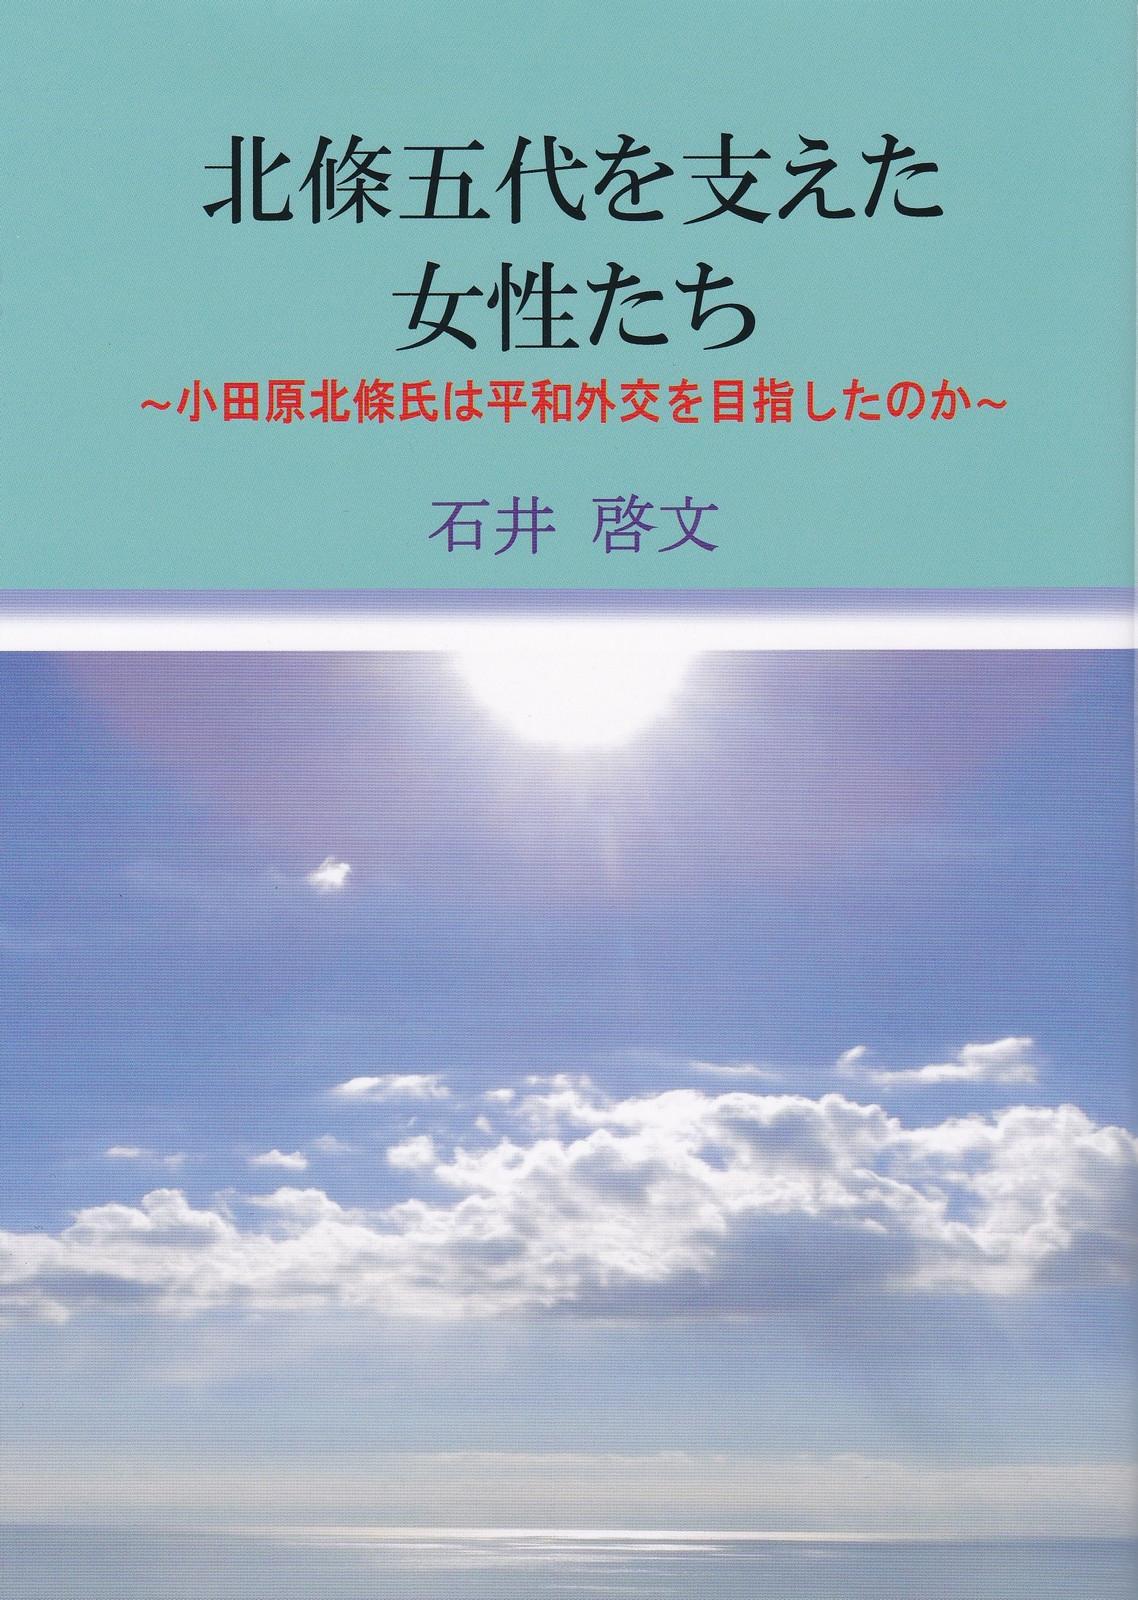 Img_20170621_0001